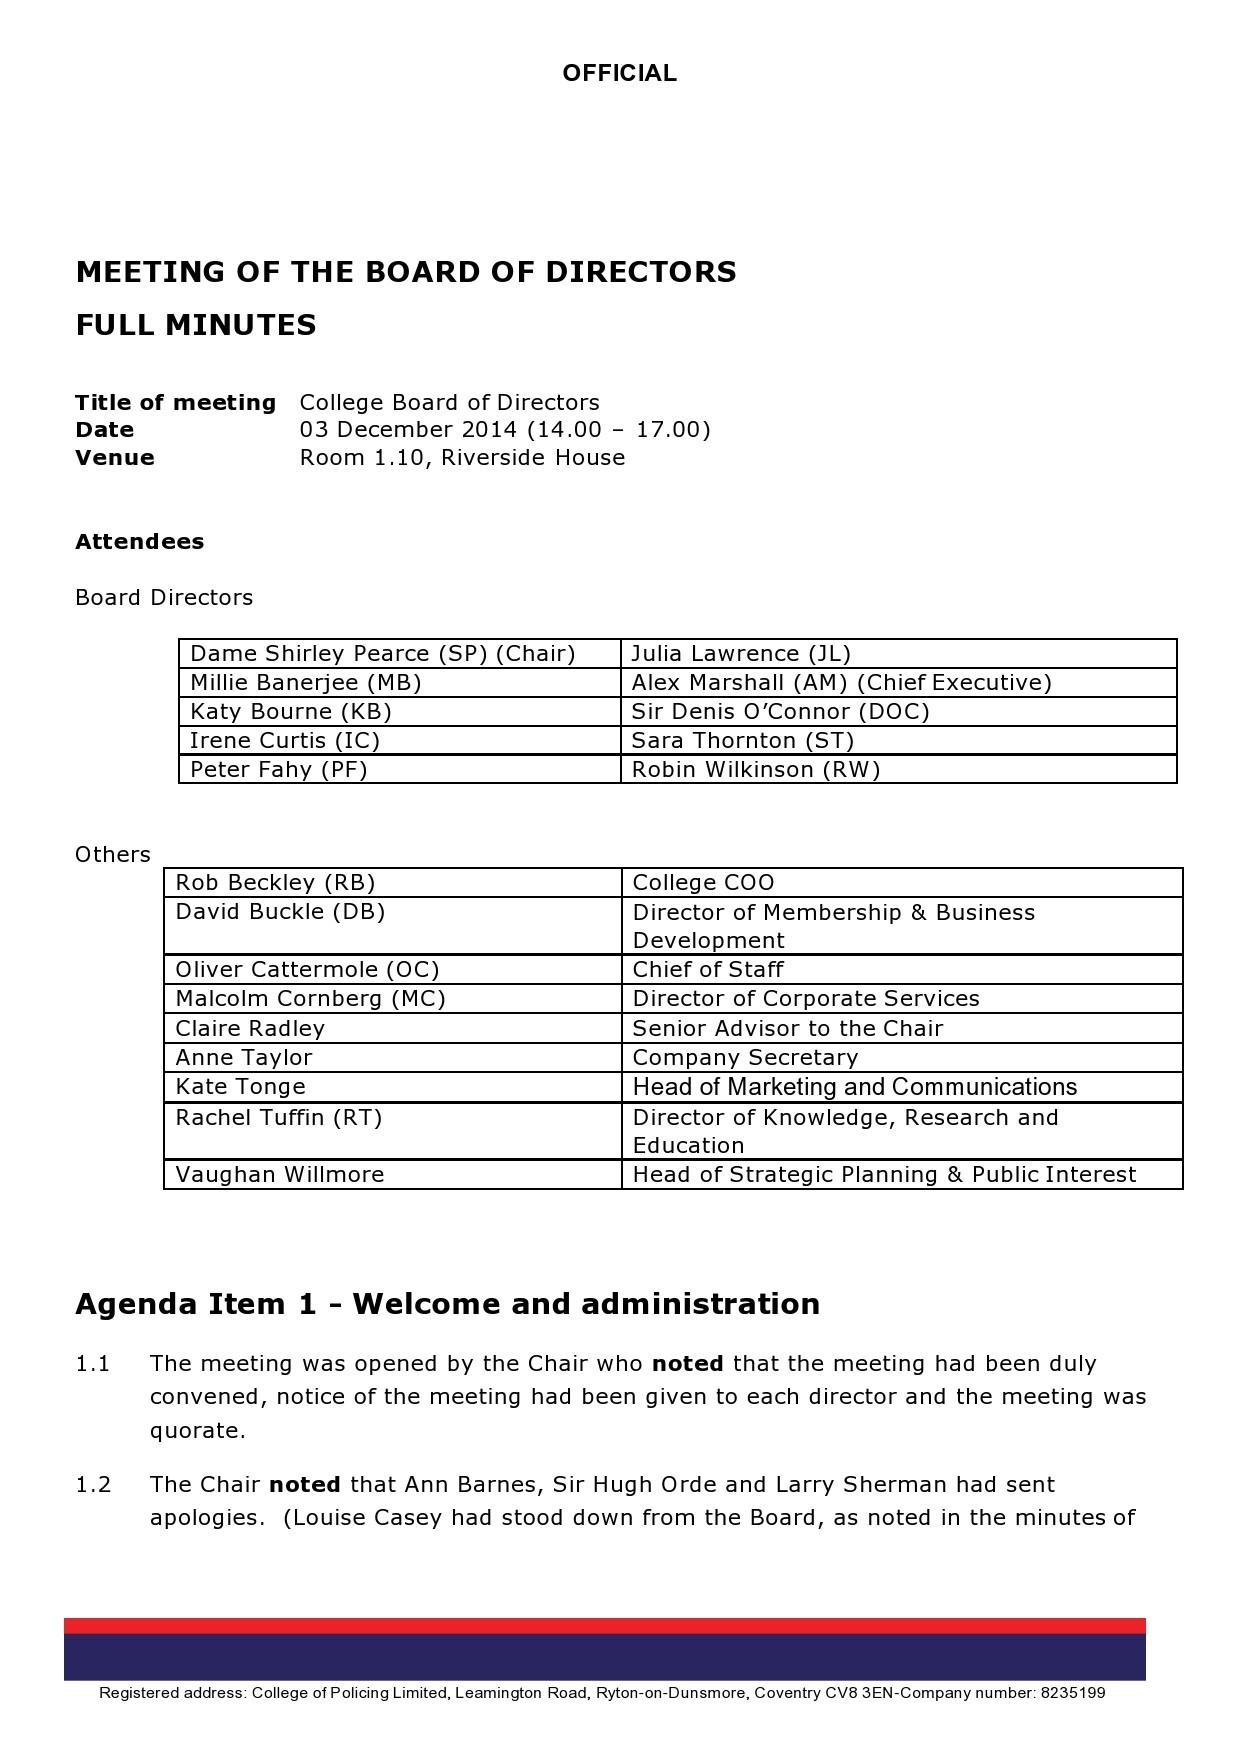 03/01/2018· board of directors annual meeting agenda (free template) jan 03. 40 Board Meeting Agenda Templates 100 Free Á… Templatelab